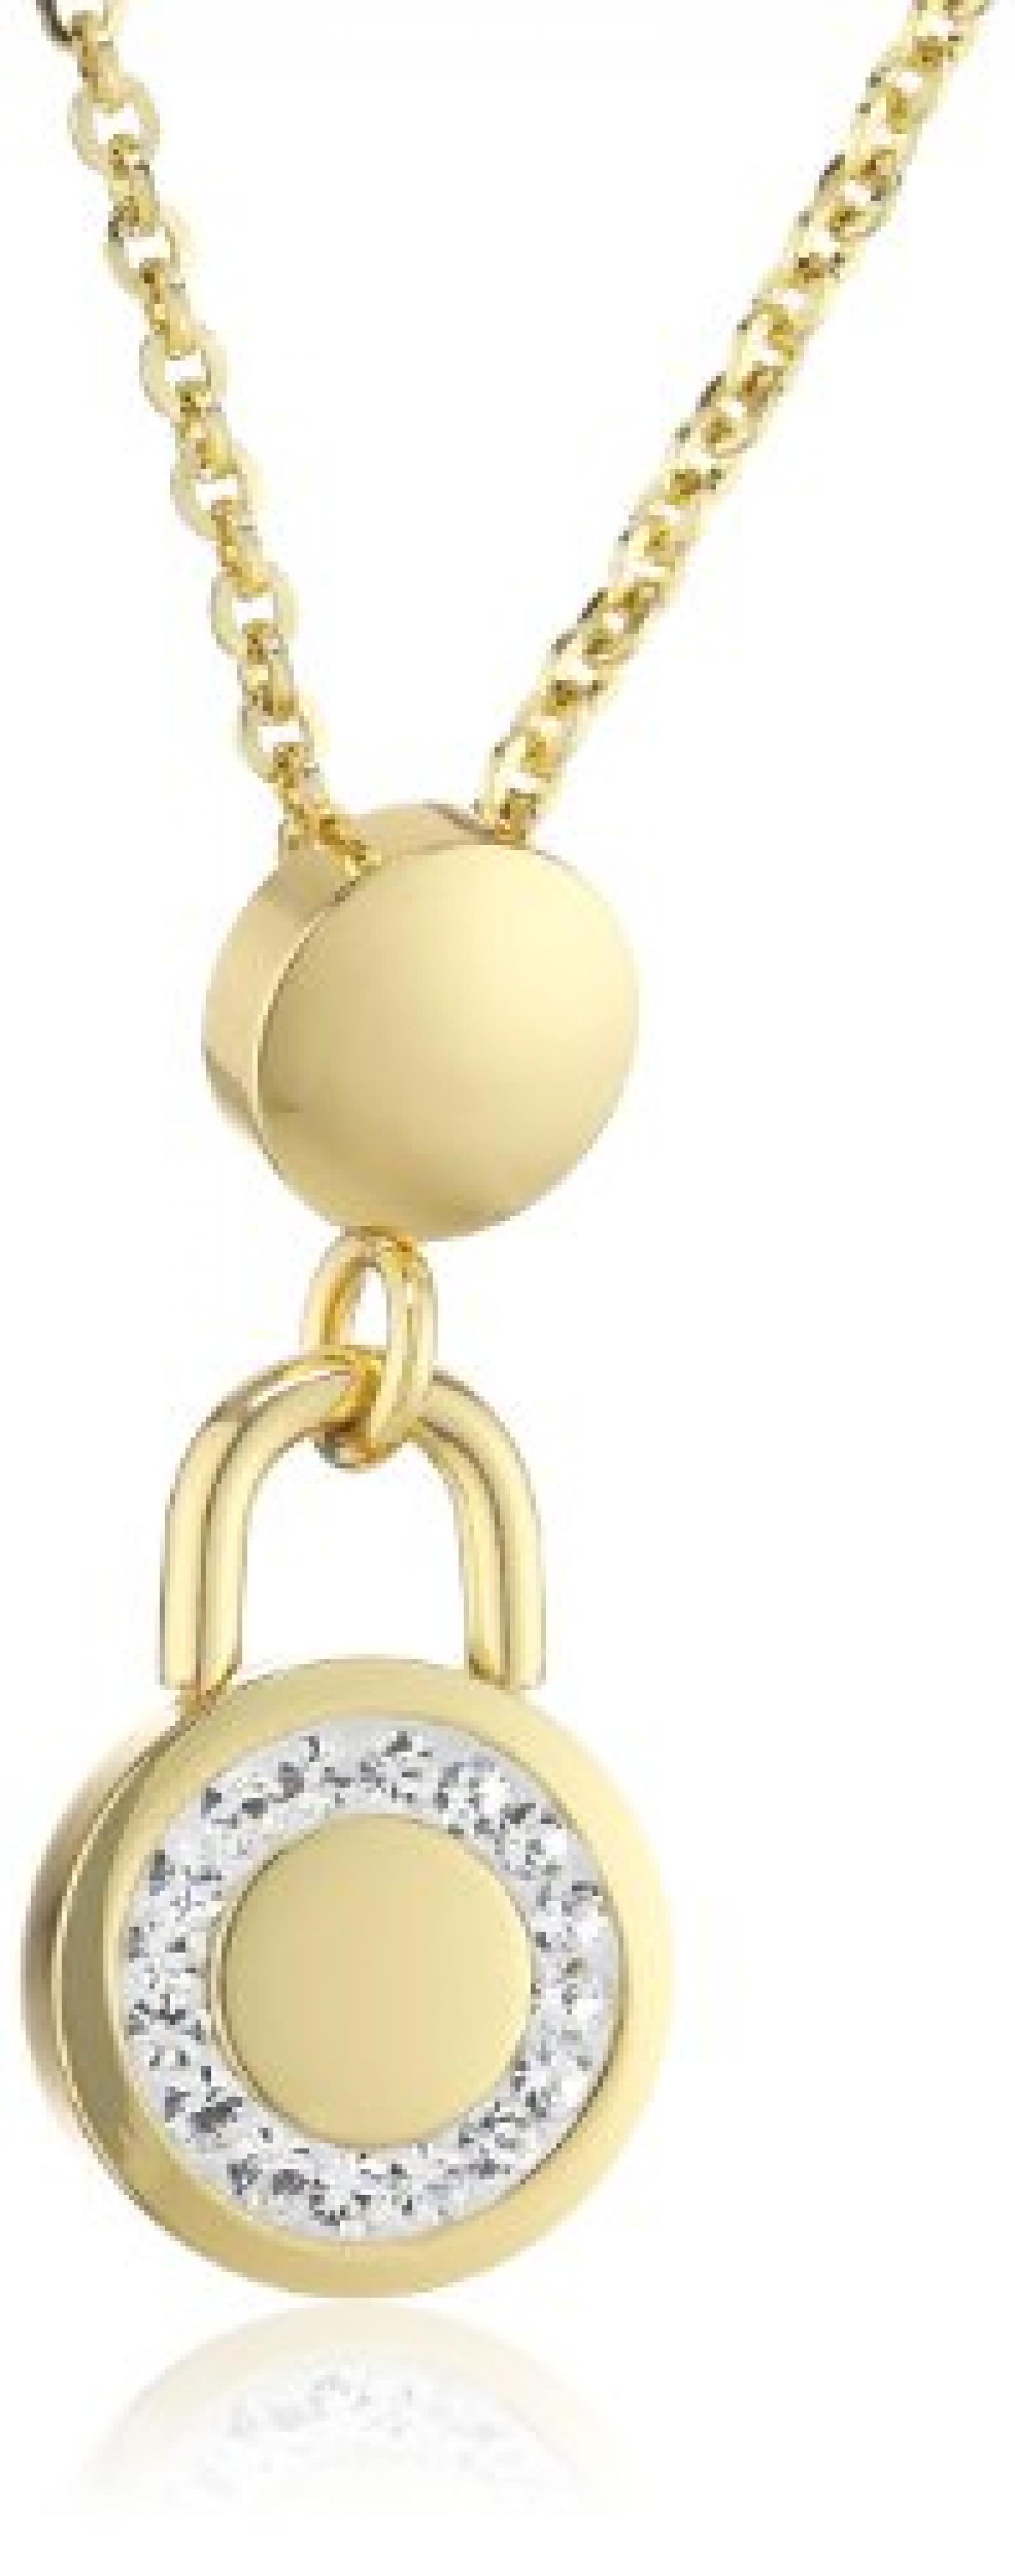 Mike Ellis New York Damen Halskette Edelstahl Zirkonia 42.0 cm gold S254 IPG